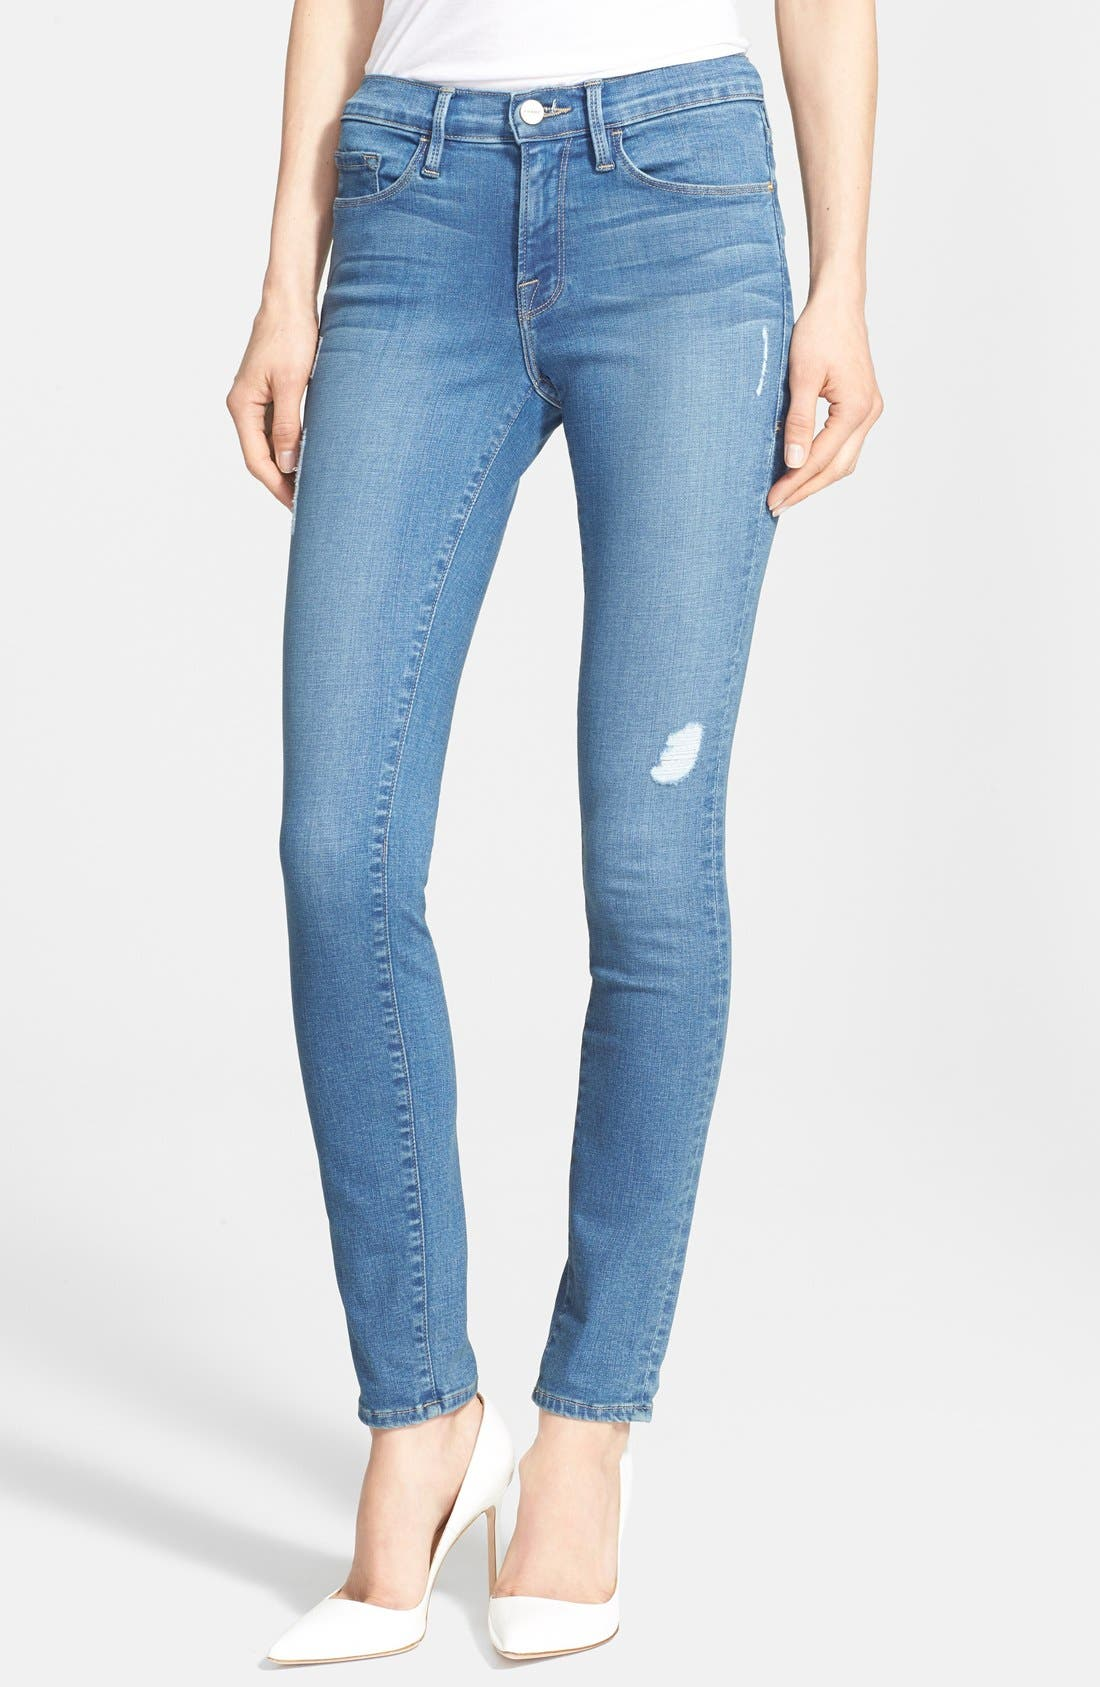 Main Image - Frame Denim 'Le Skinny de Jeanne' Jeans (Alverstone) (Nordstrom Exclusive)